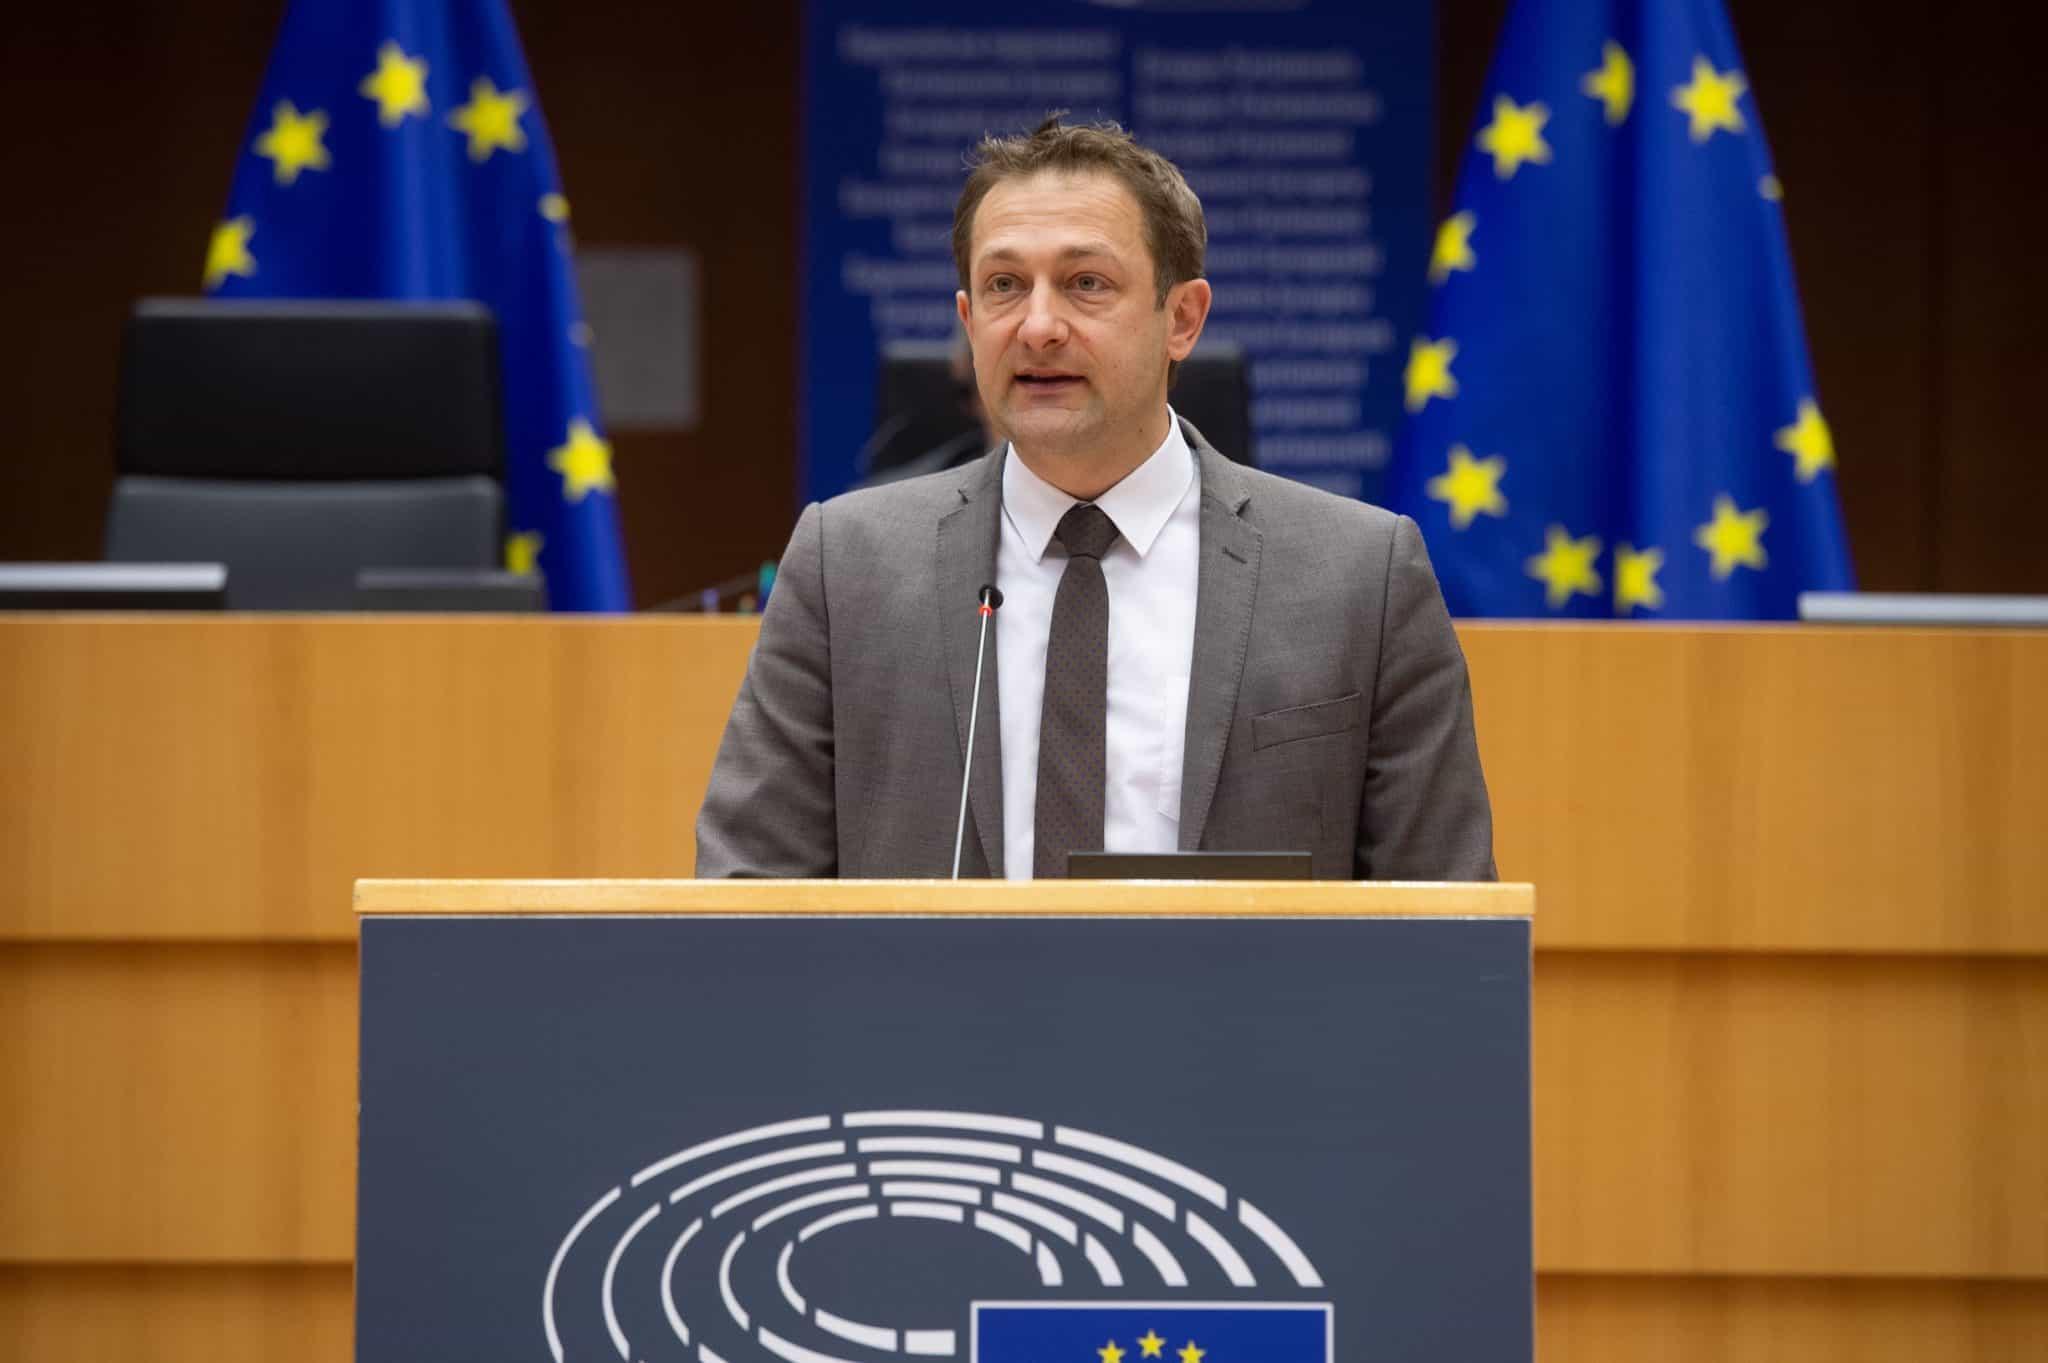 Christophe Hansen, rapporteur for the Committee on International Trade